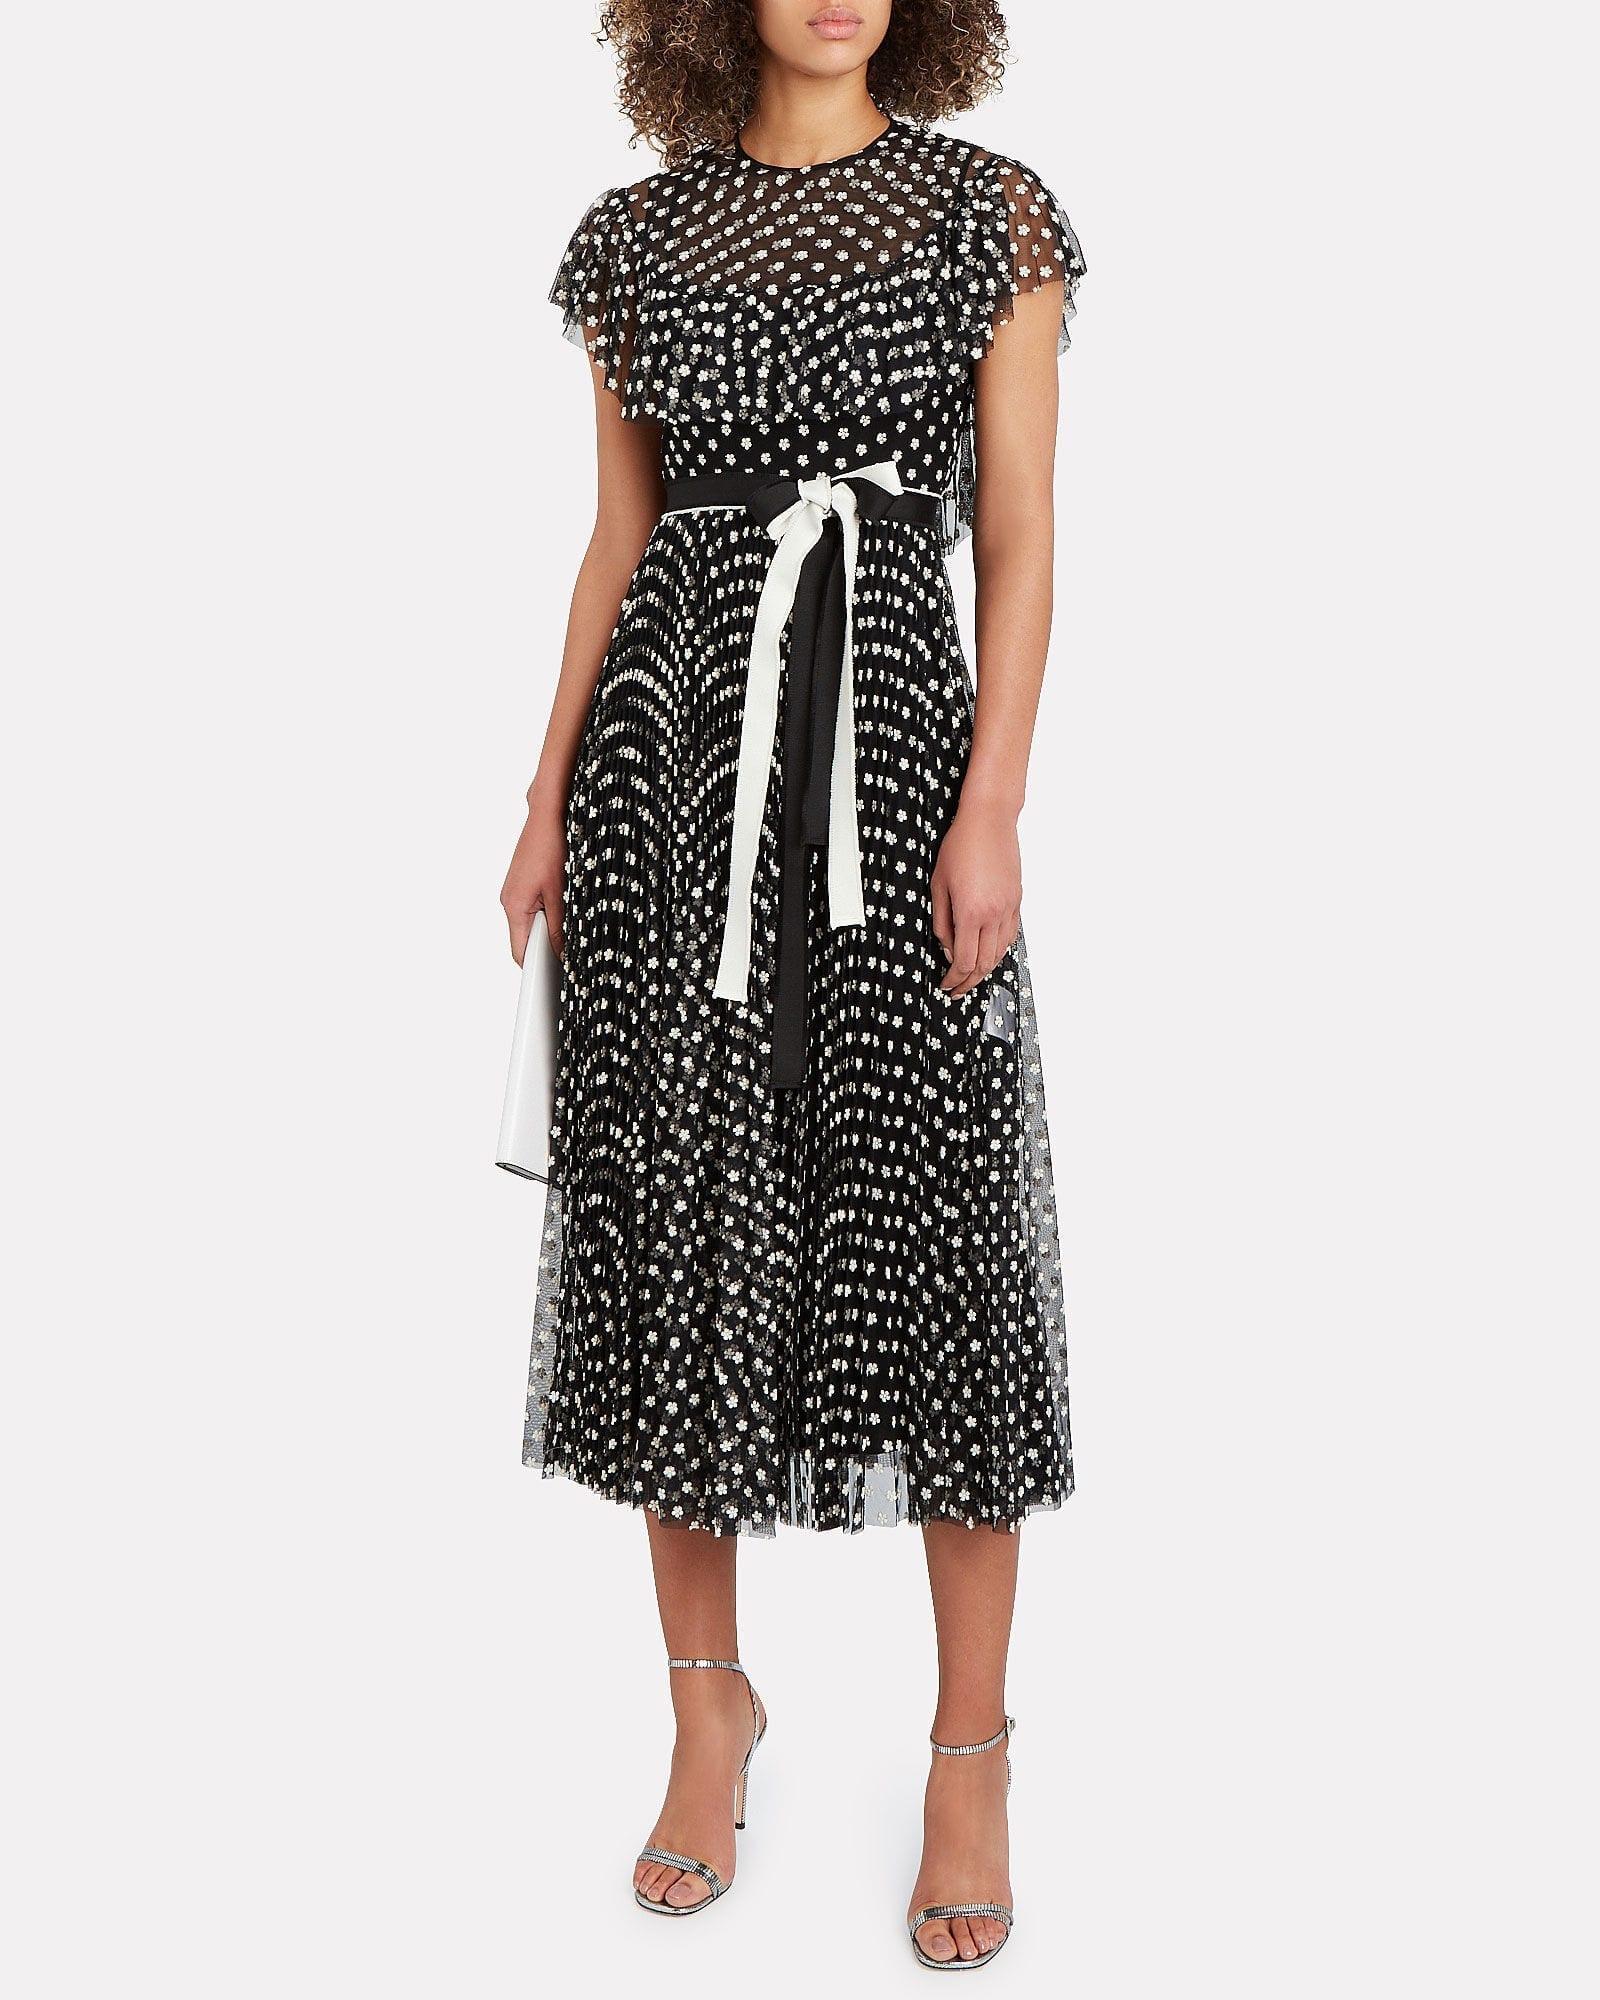 REDVALENTINO Embroidered Tulle Midi Dress